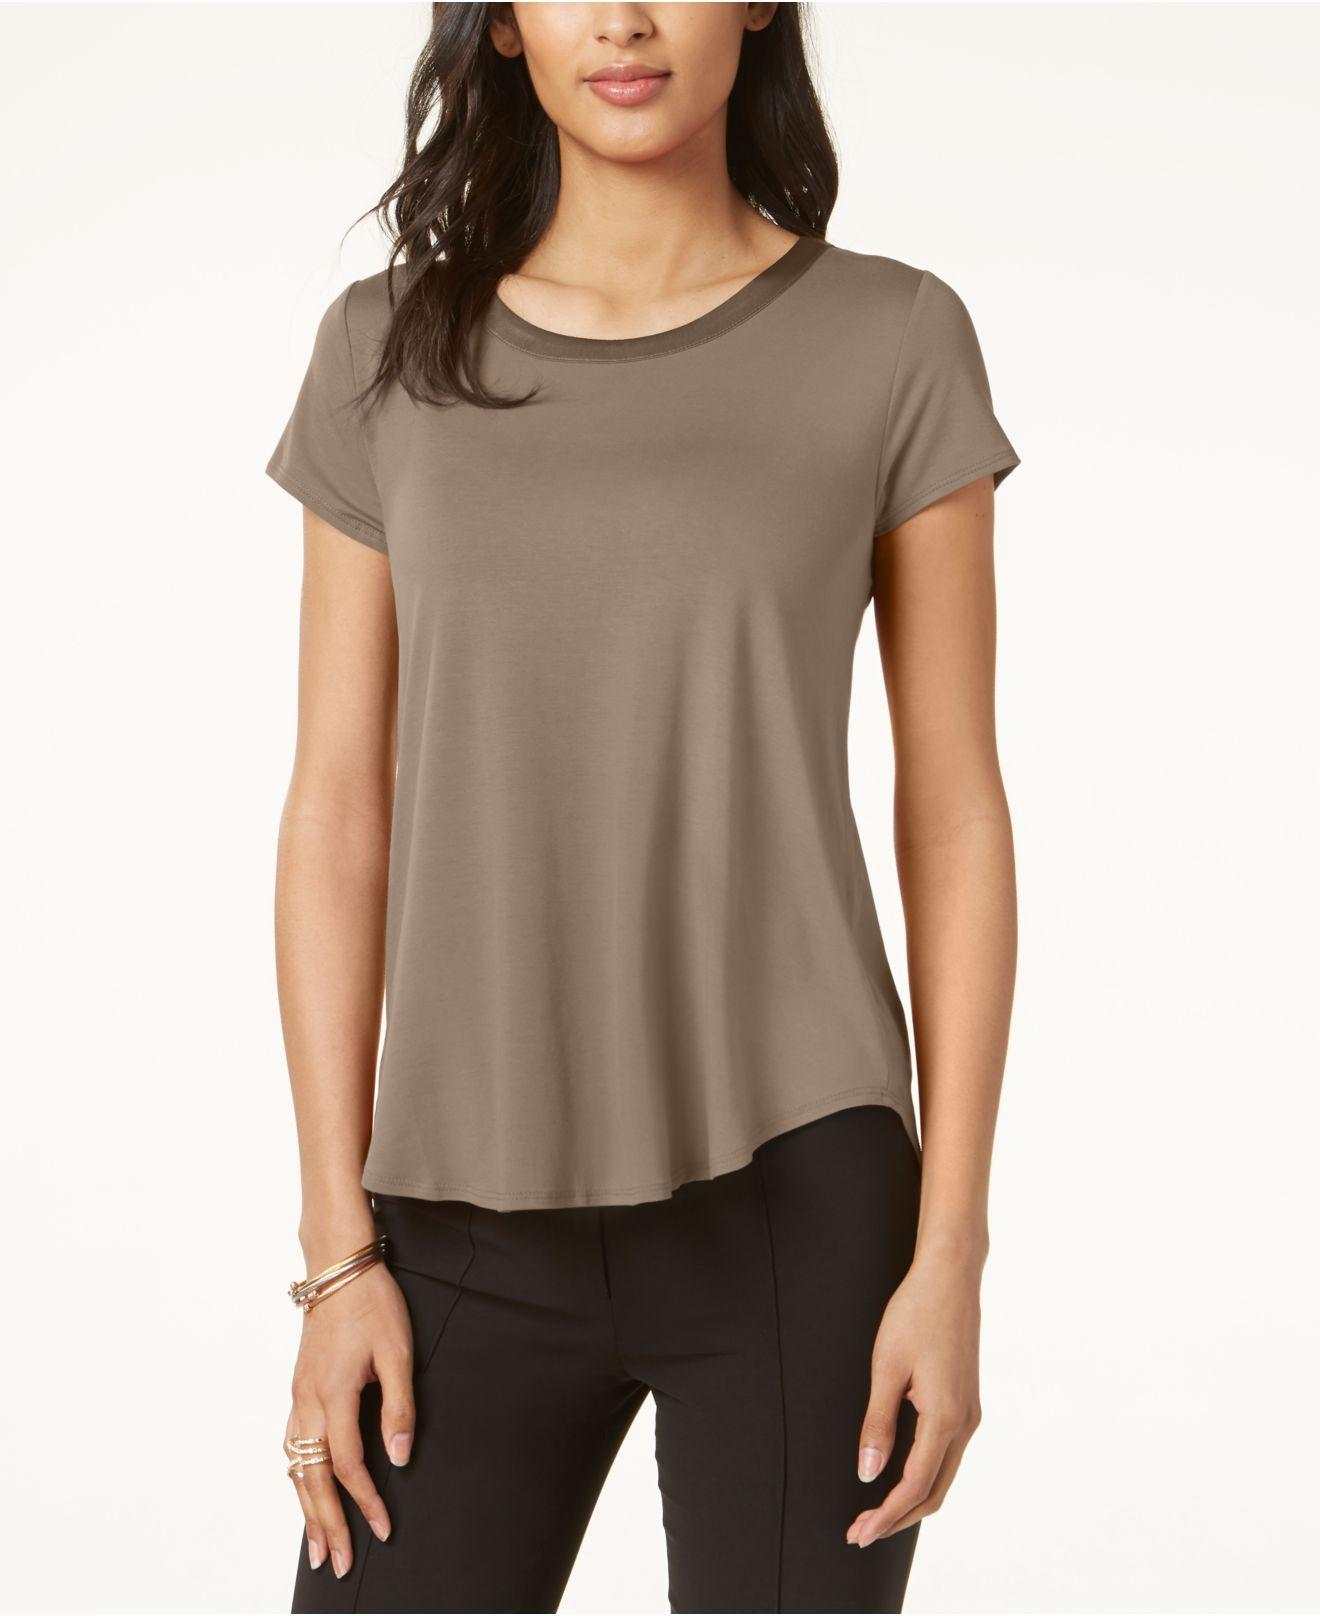 69596ae3a Alfani. Women s Satin-trim High-low T-shirt